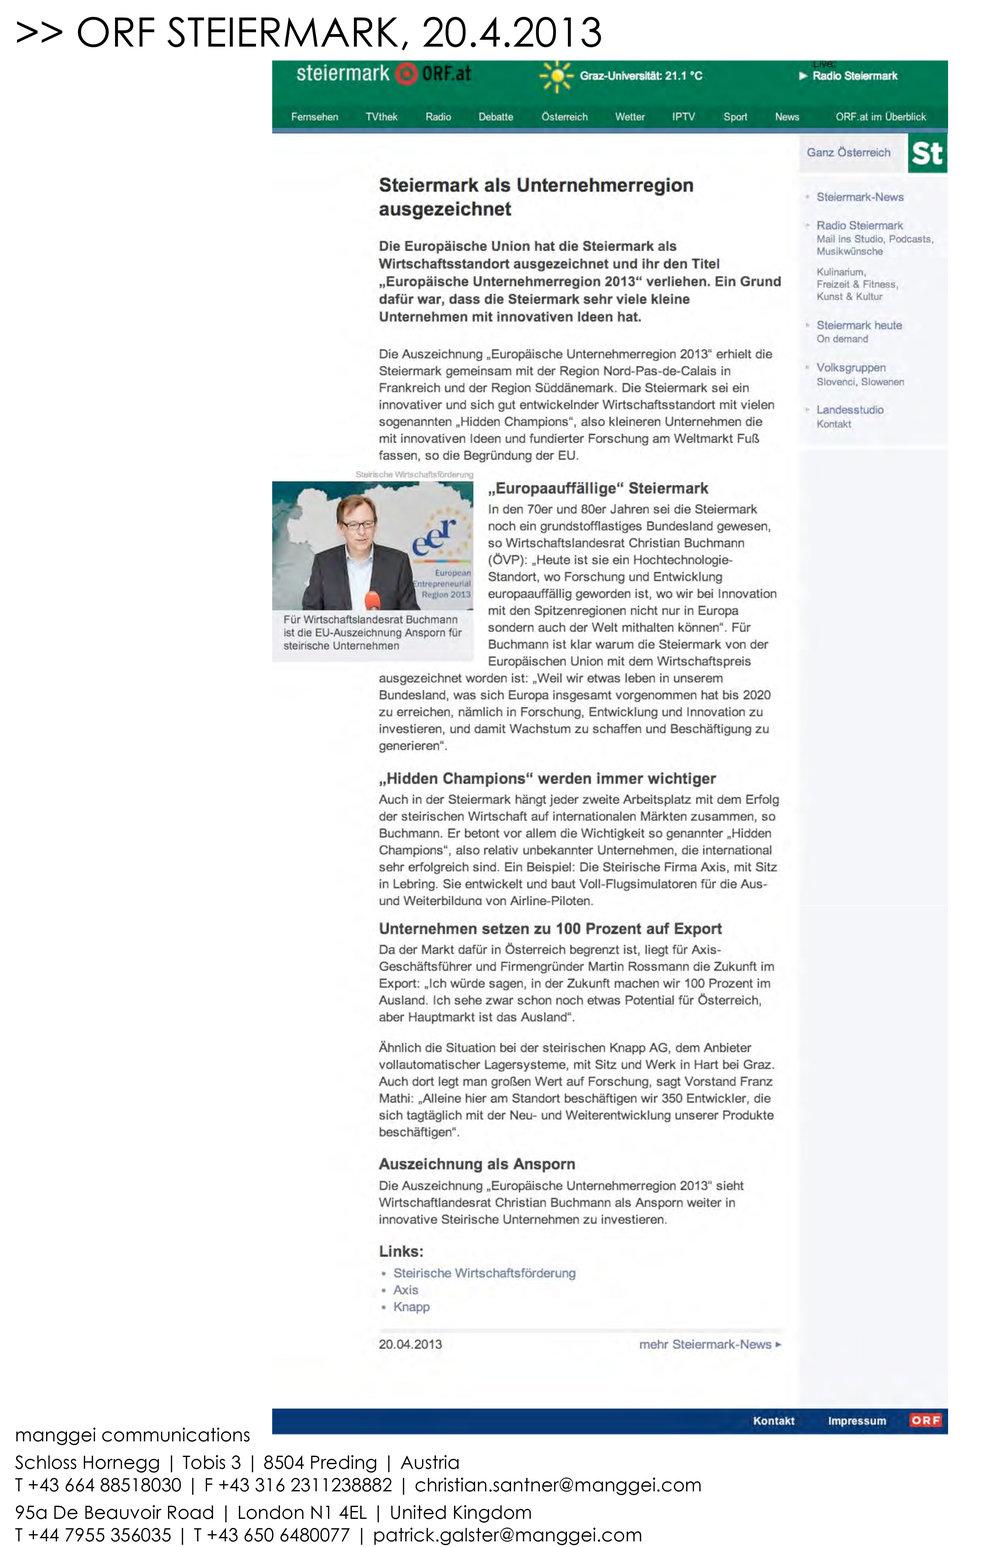 manggei-communications---presse-clippings-komplett---journalistenreise-2013_-18.jpg